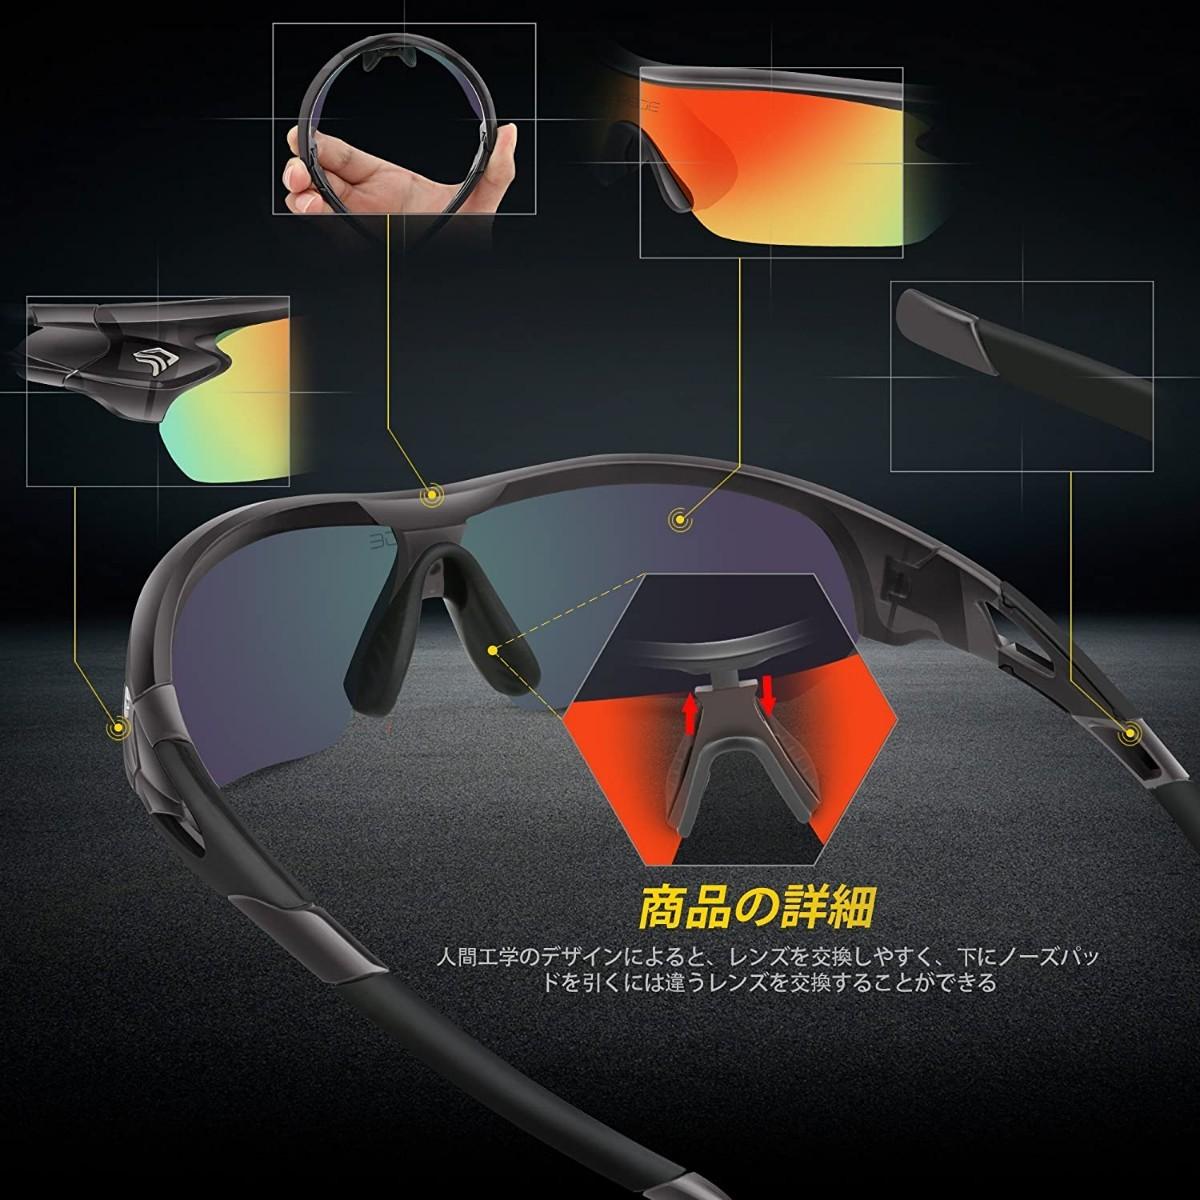 Torege スポーツサングラス 交換レンズ5枚 UV400